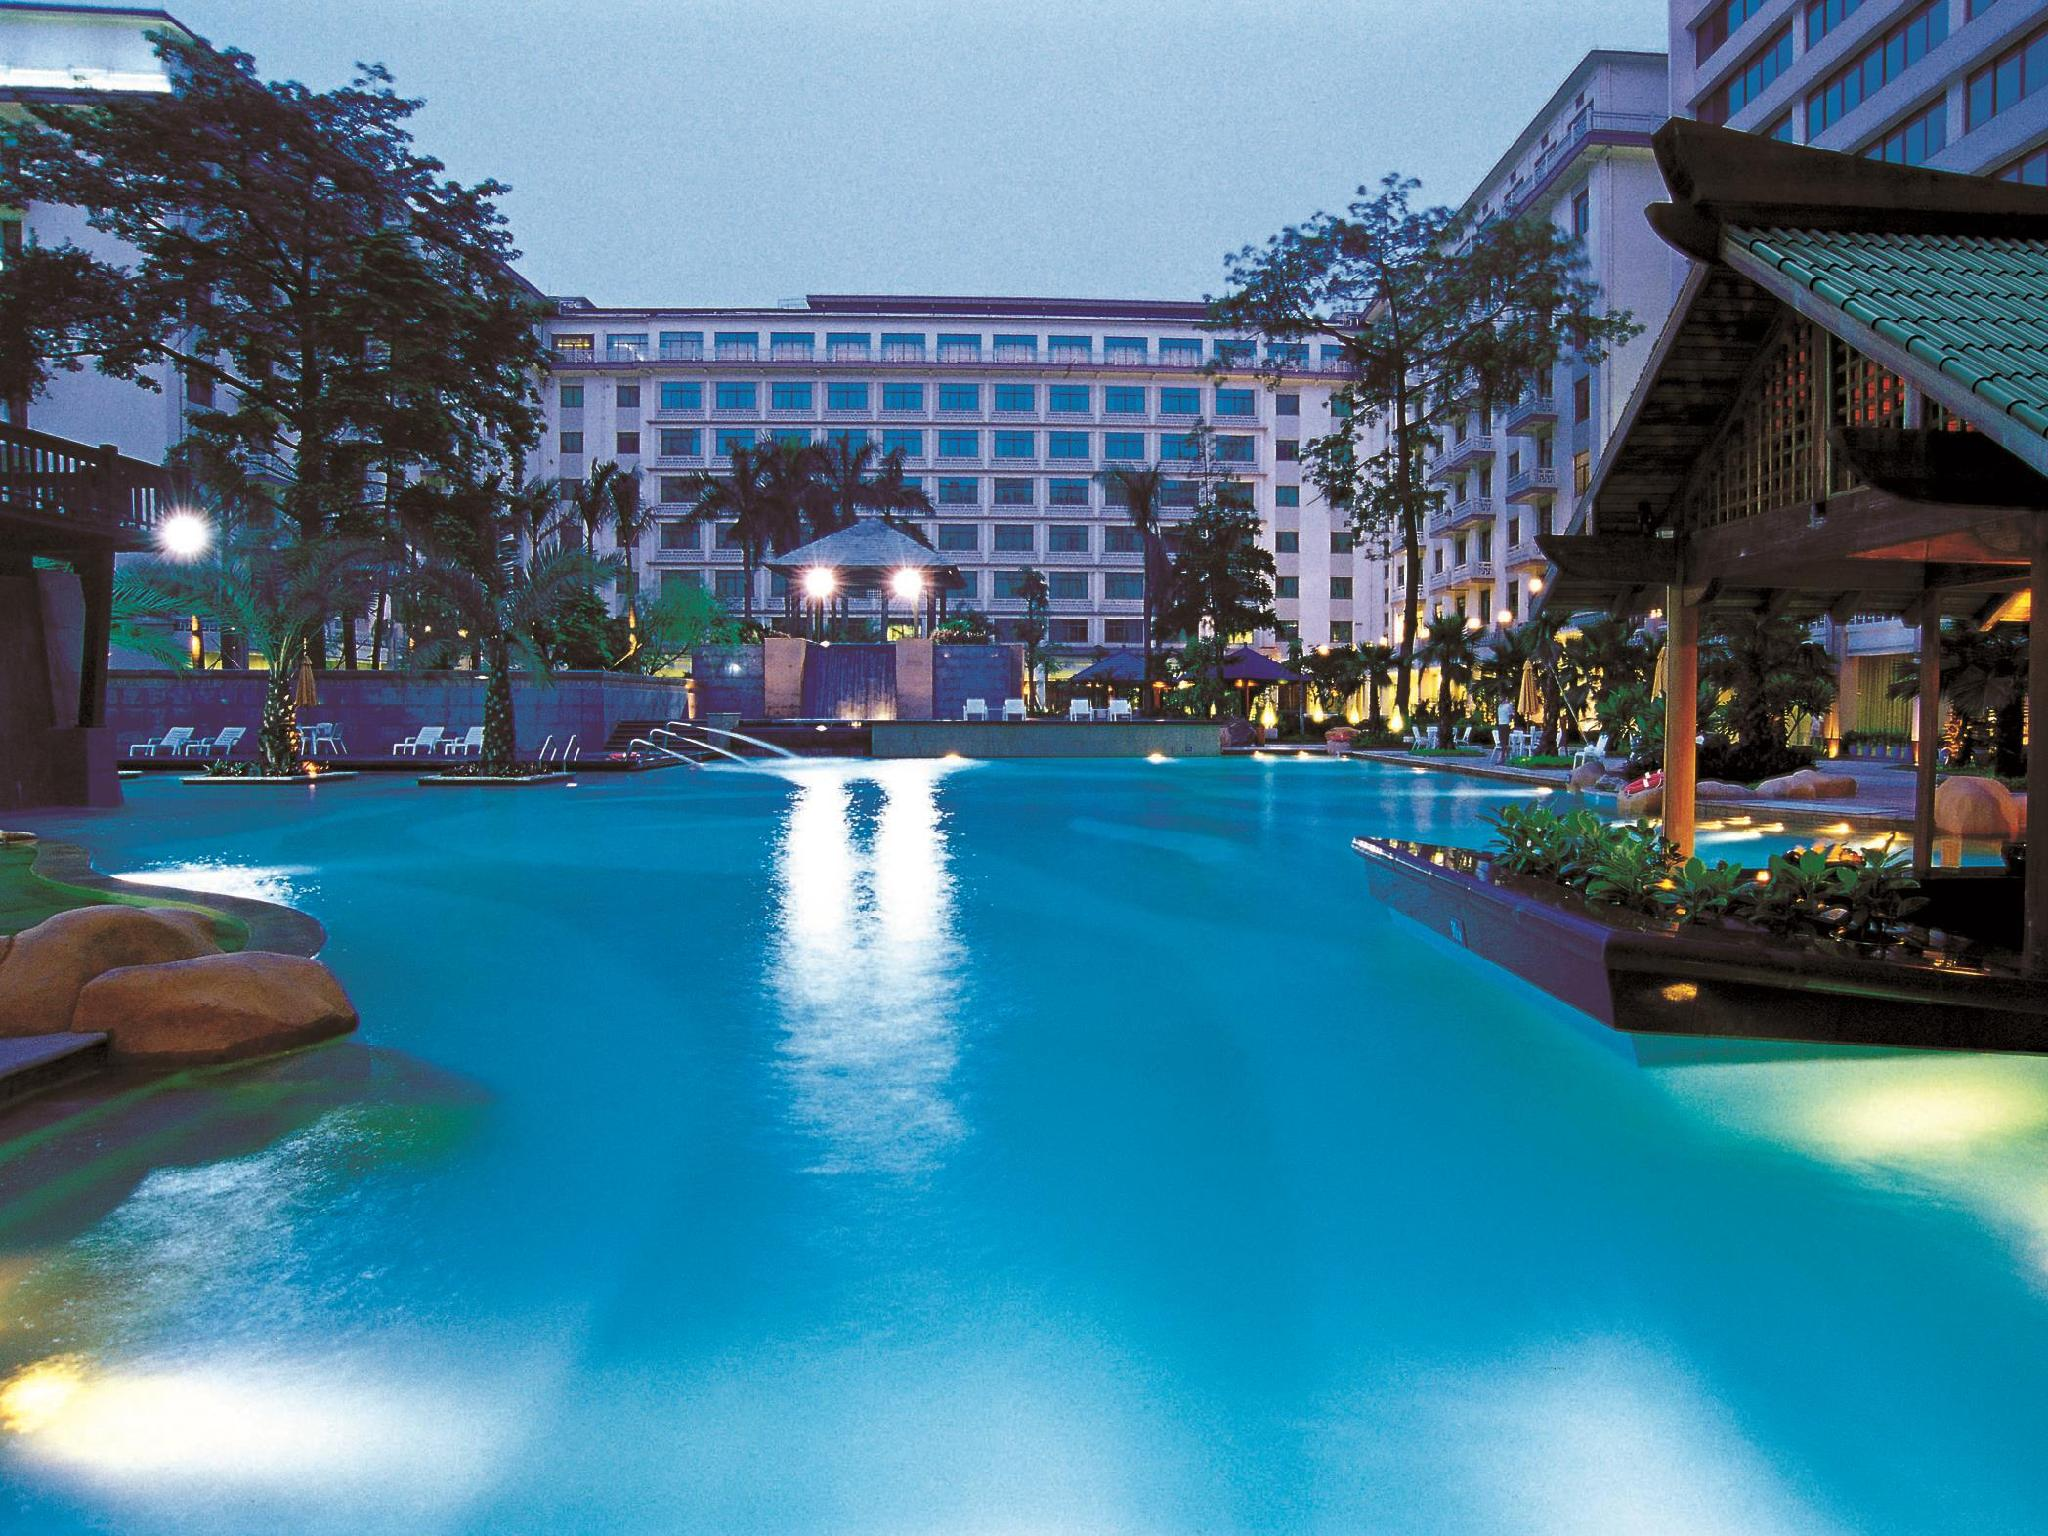 7 Days Inn Guangzhou Fang Cun Branch Is Dong Fang Hotel Near Canton Fair Canton Fair Hotels